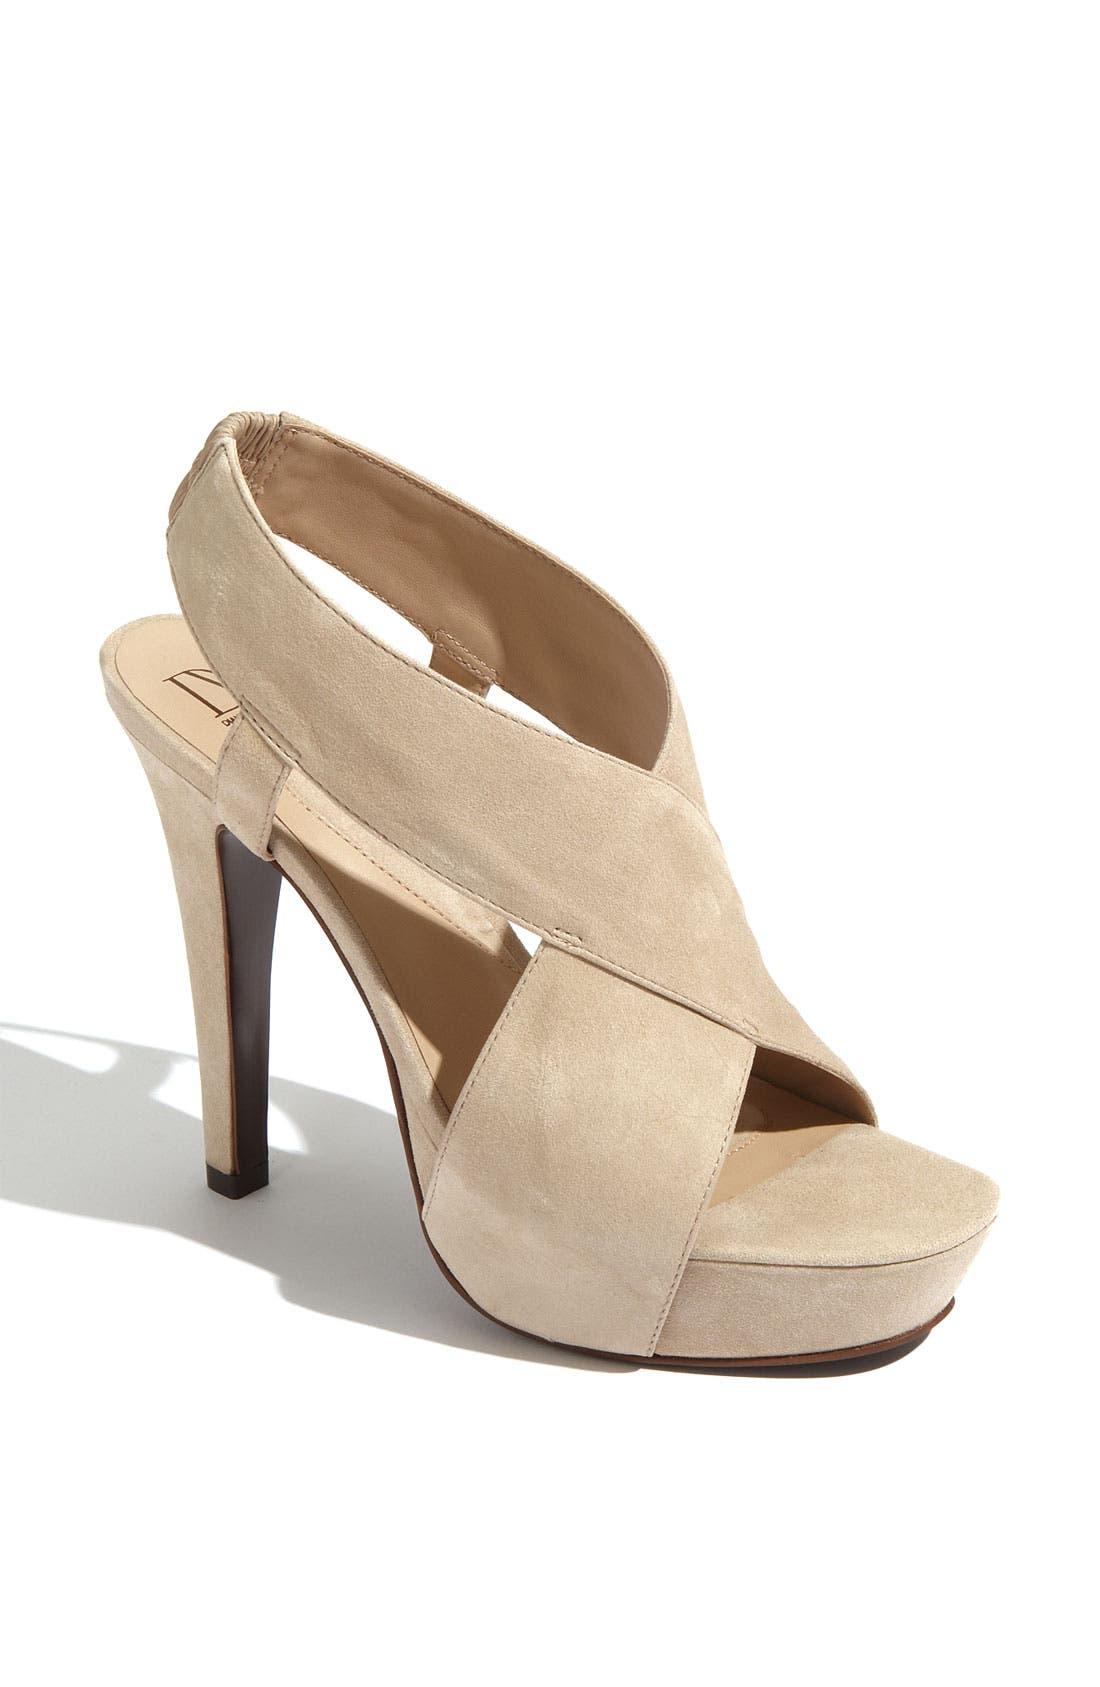 Alternate Image 1 Selected - Diane von Furstenberg 'Zia' Platform Sandal